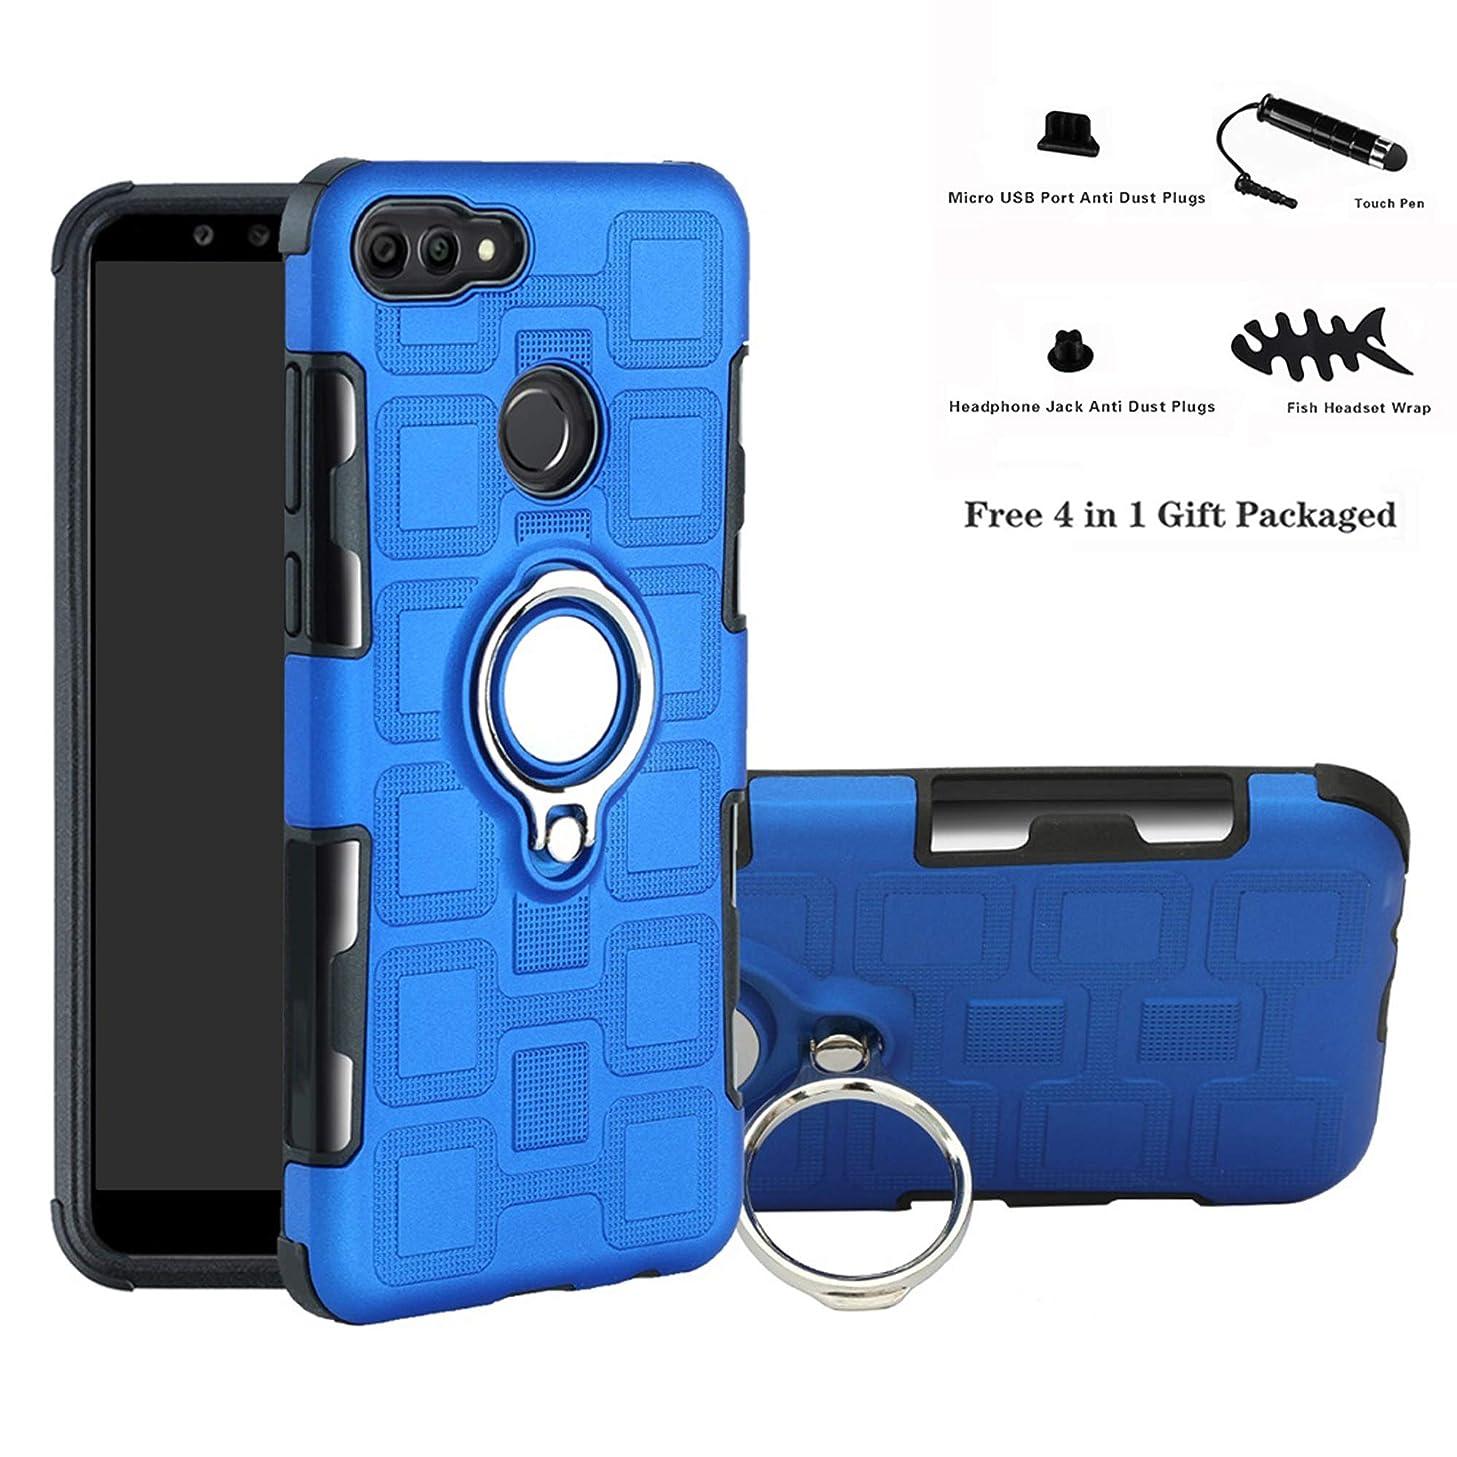 Huawei Y9 / Enjoy 8 Plus case,Labanema Hybrid Dual Layer 360 Degree Rotation Ring Holder Kickstand Armor Slim Protective Cover for Huawei Y9 2018 / Enjoy 8 Plus - Blue